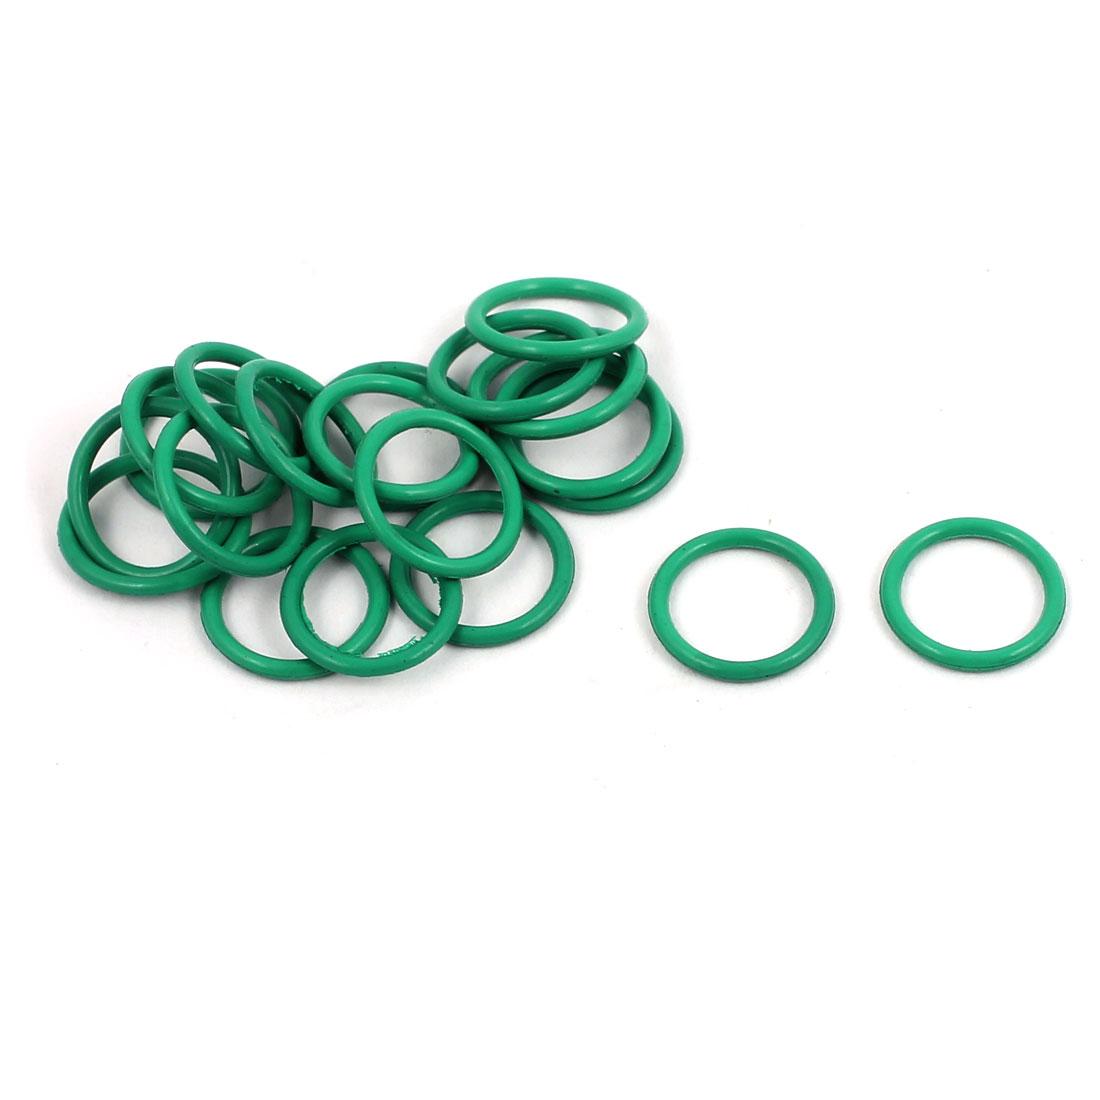 20Pcs 9mm x 1mm FKM O-rings Heat Resistant Sealing Ring Grommets Green